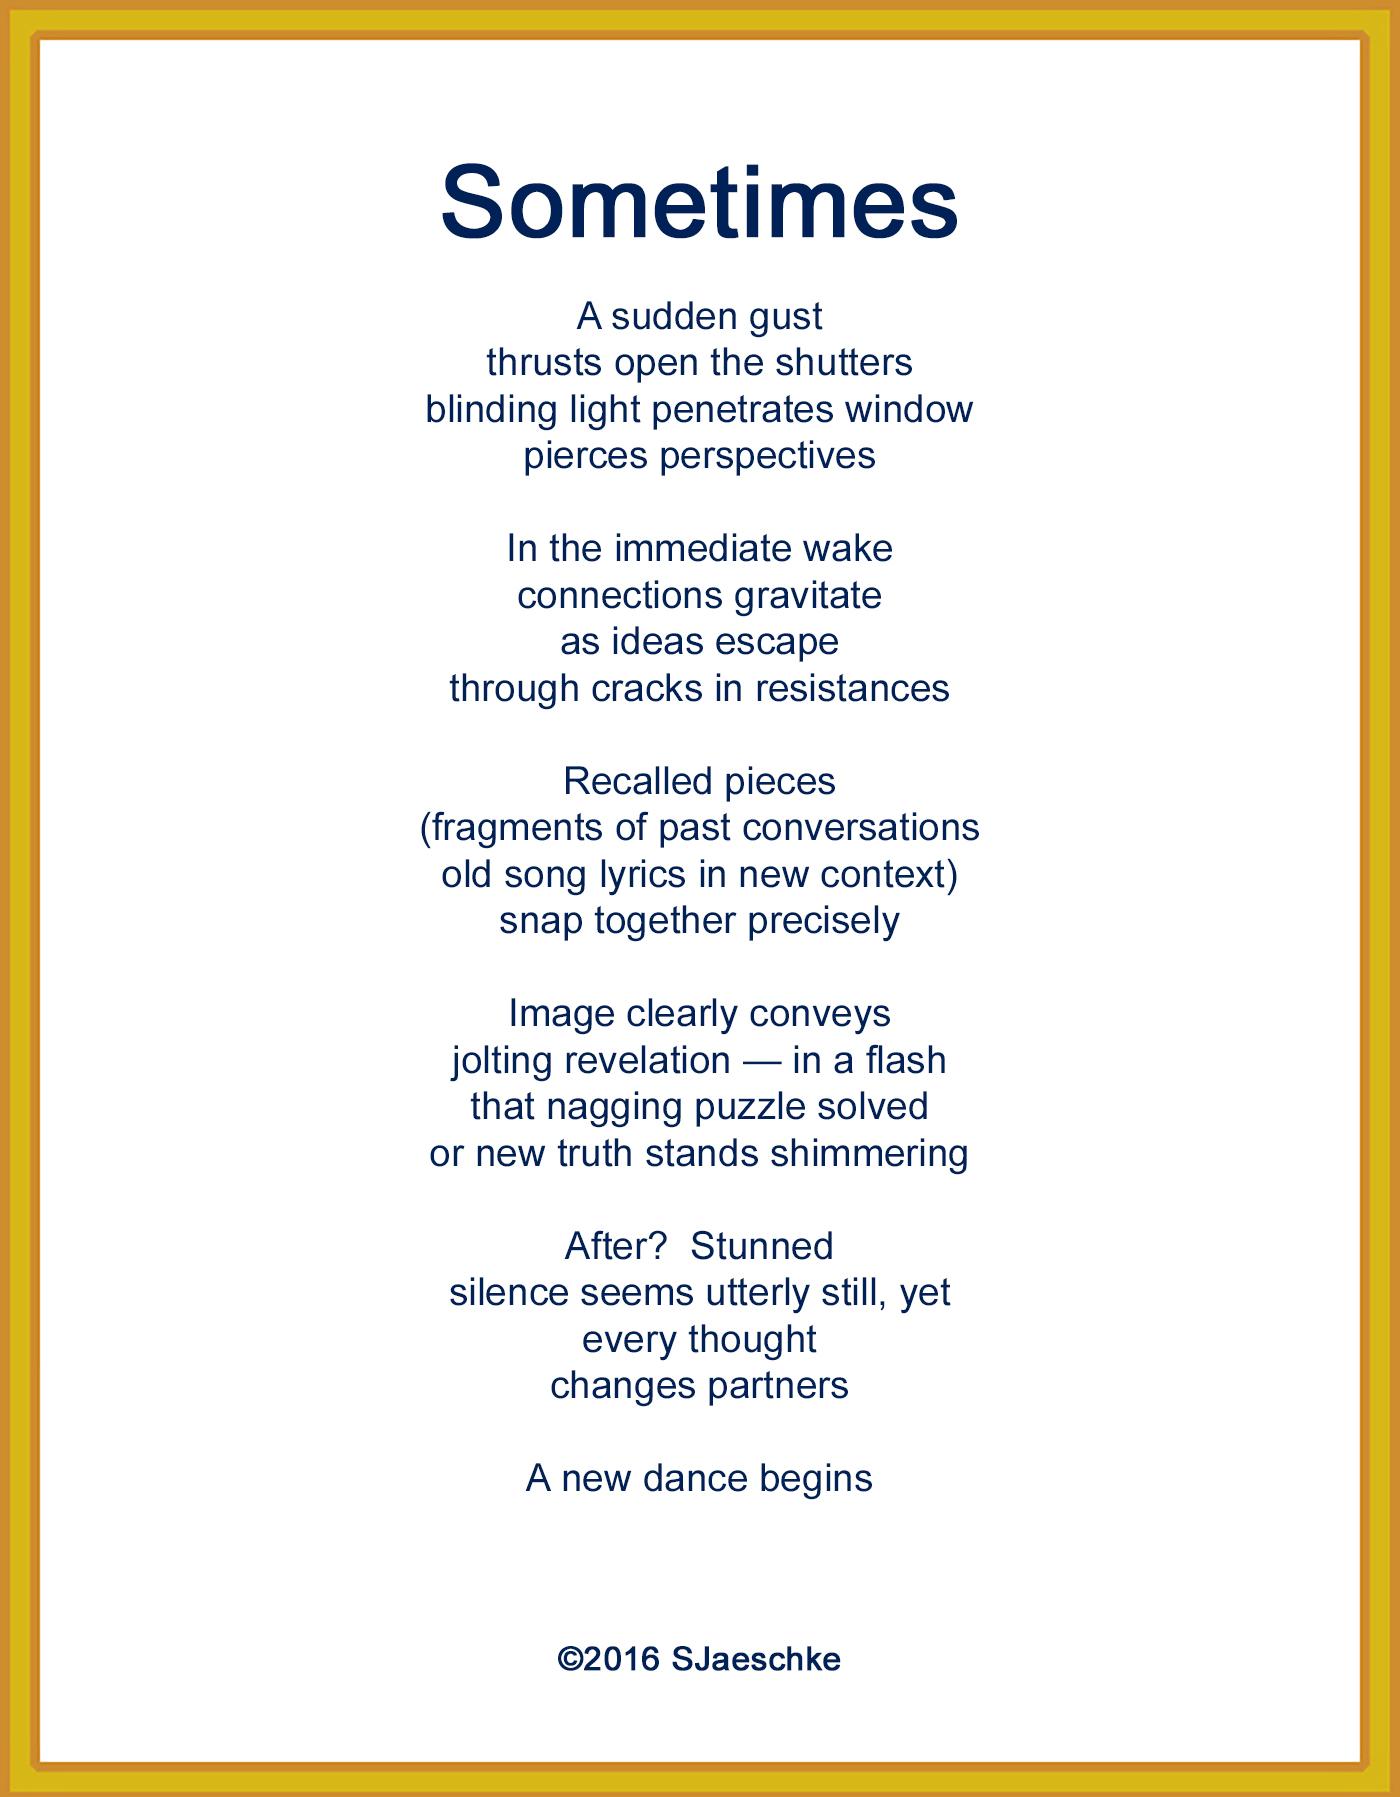 Post_2016-01-27_Poem_Sometimes